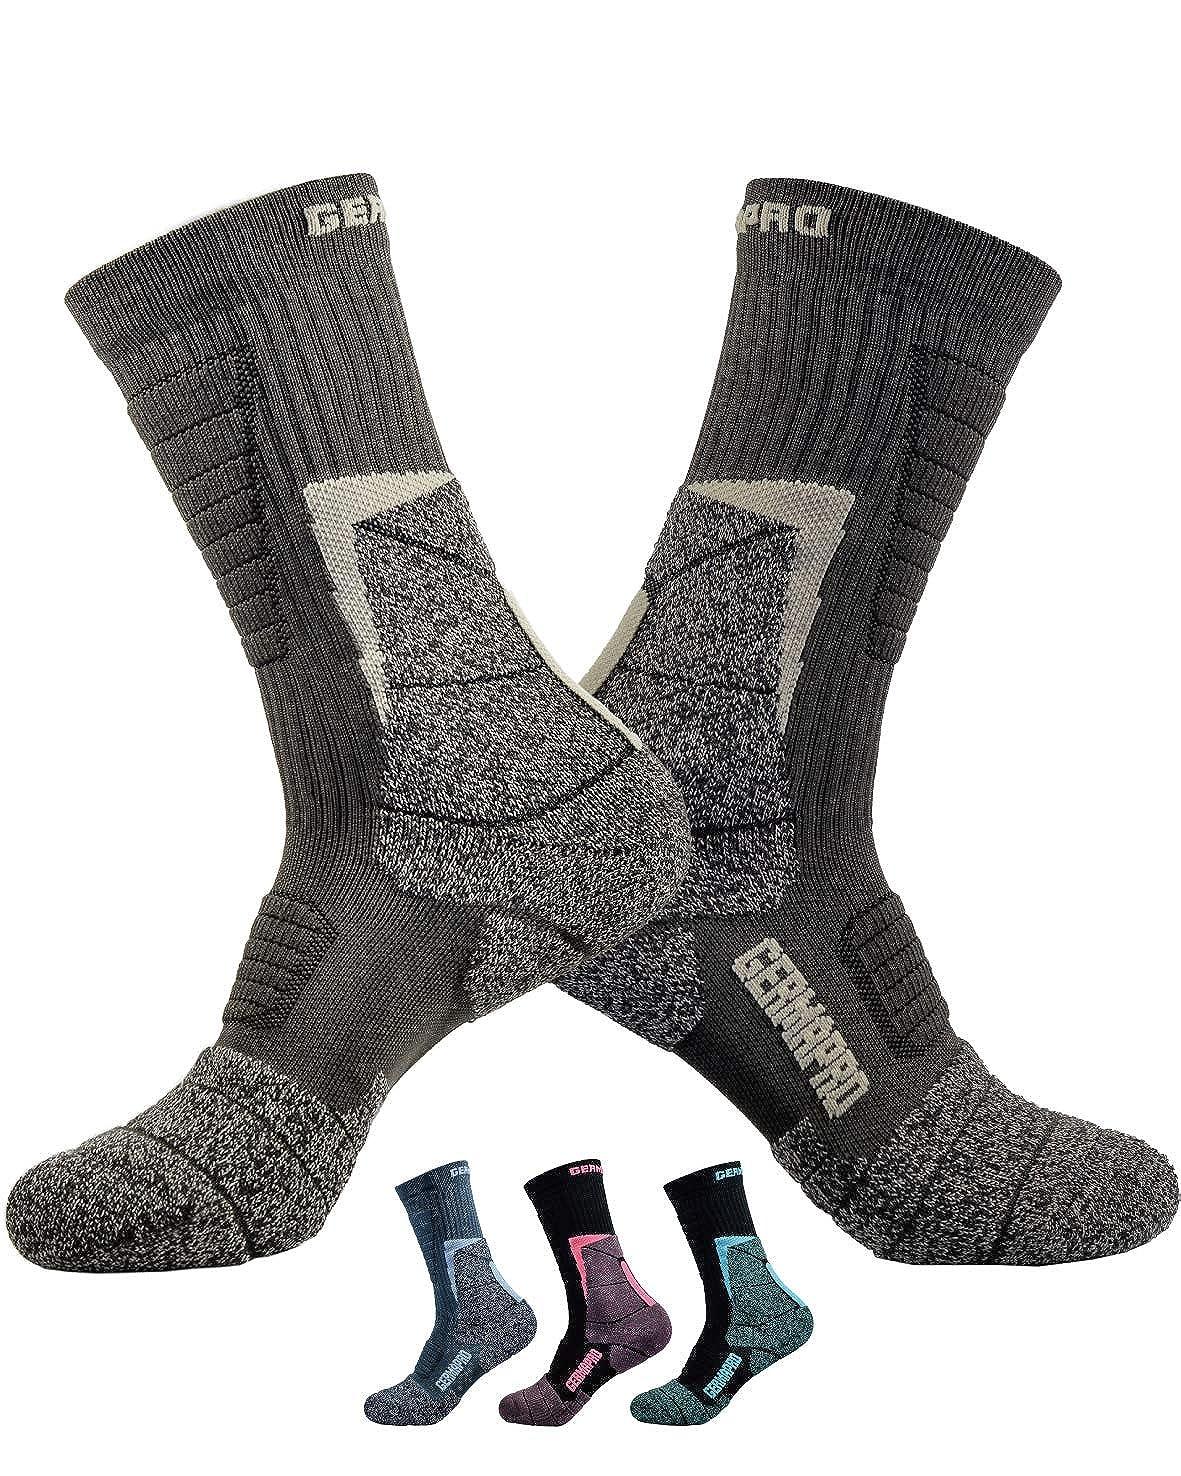 Men's Hiking Socks Outdoor Work Boot Socks w/Anti-Odor-Blister Moisture Wicking Germanium & Coolmax All Season 2 pairs